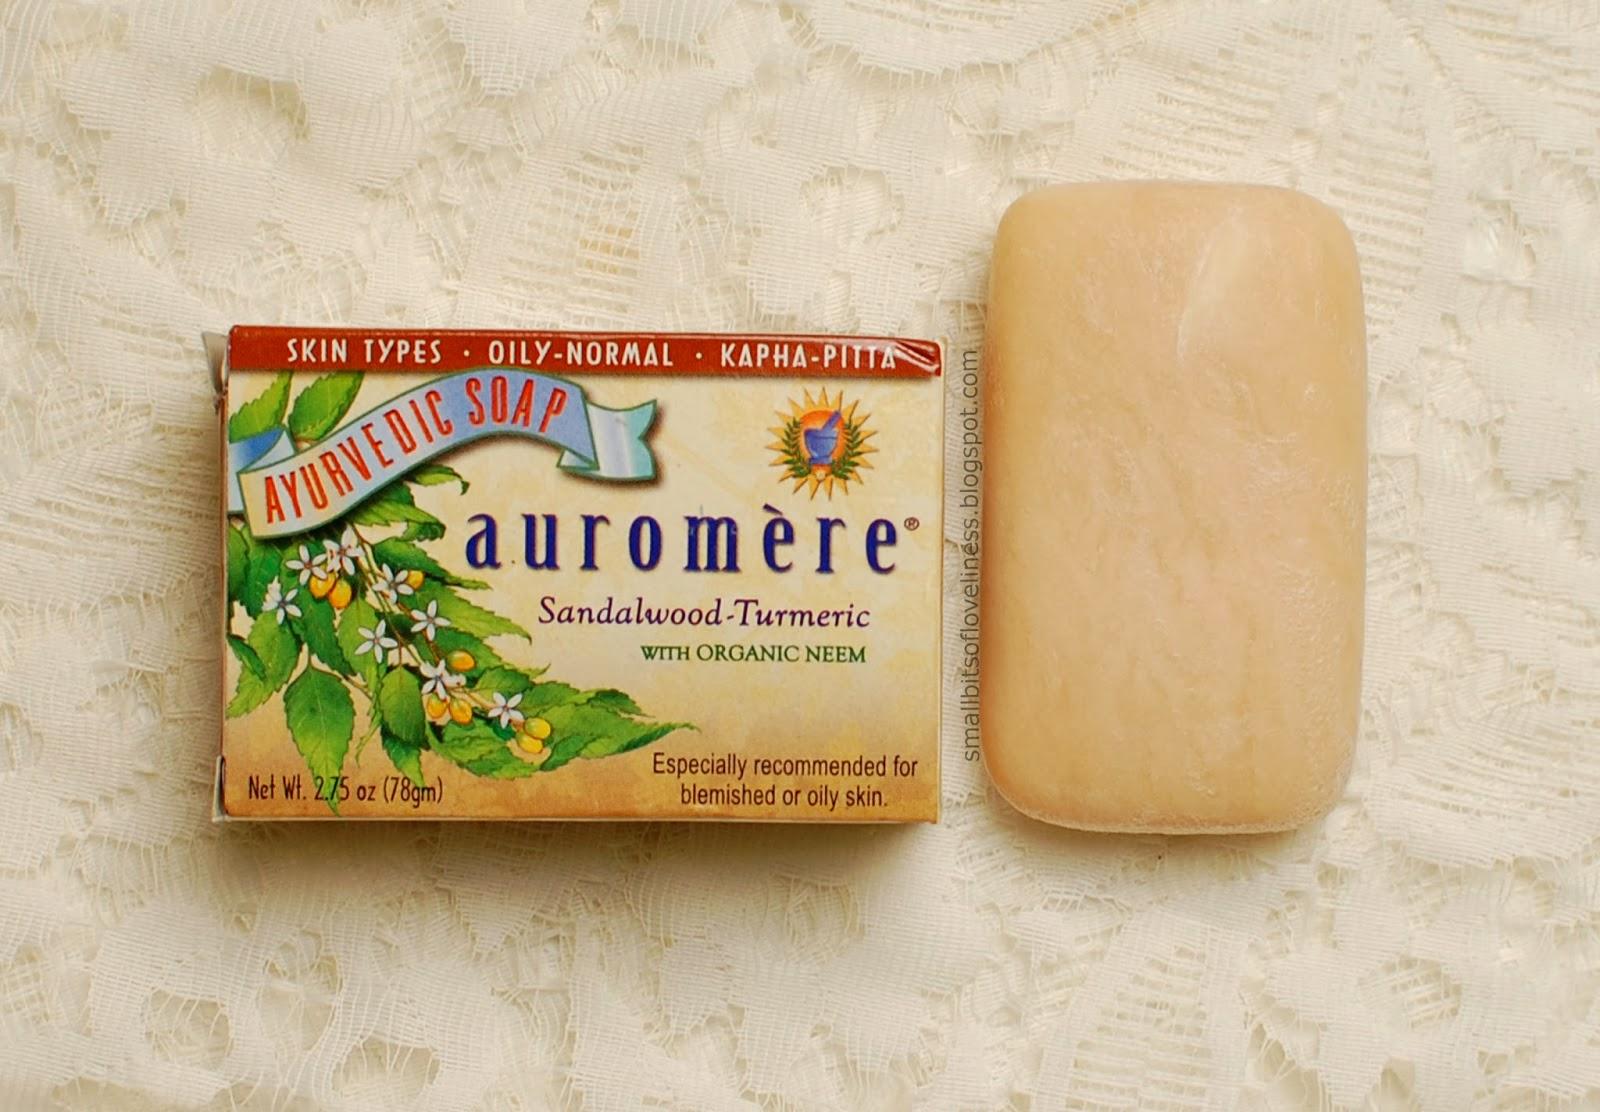 Auromere Ayurvedic Soap Sandalwood Turmeric with Organic Neem